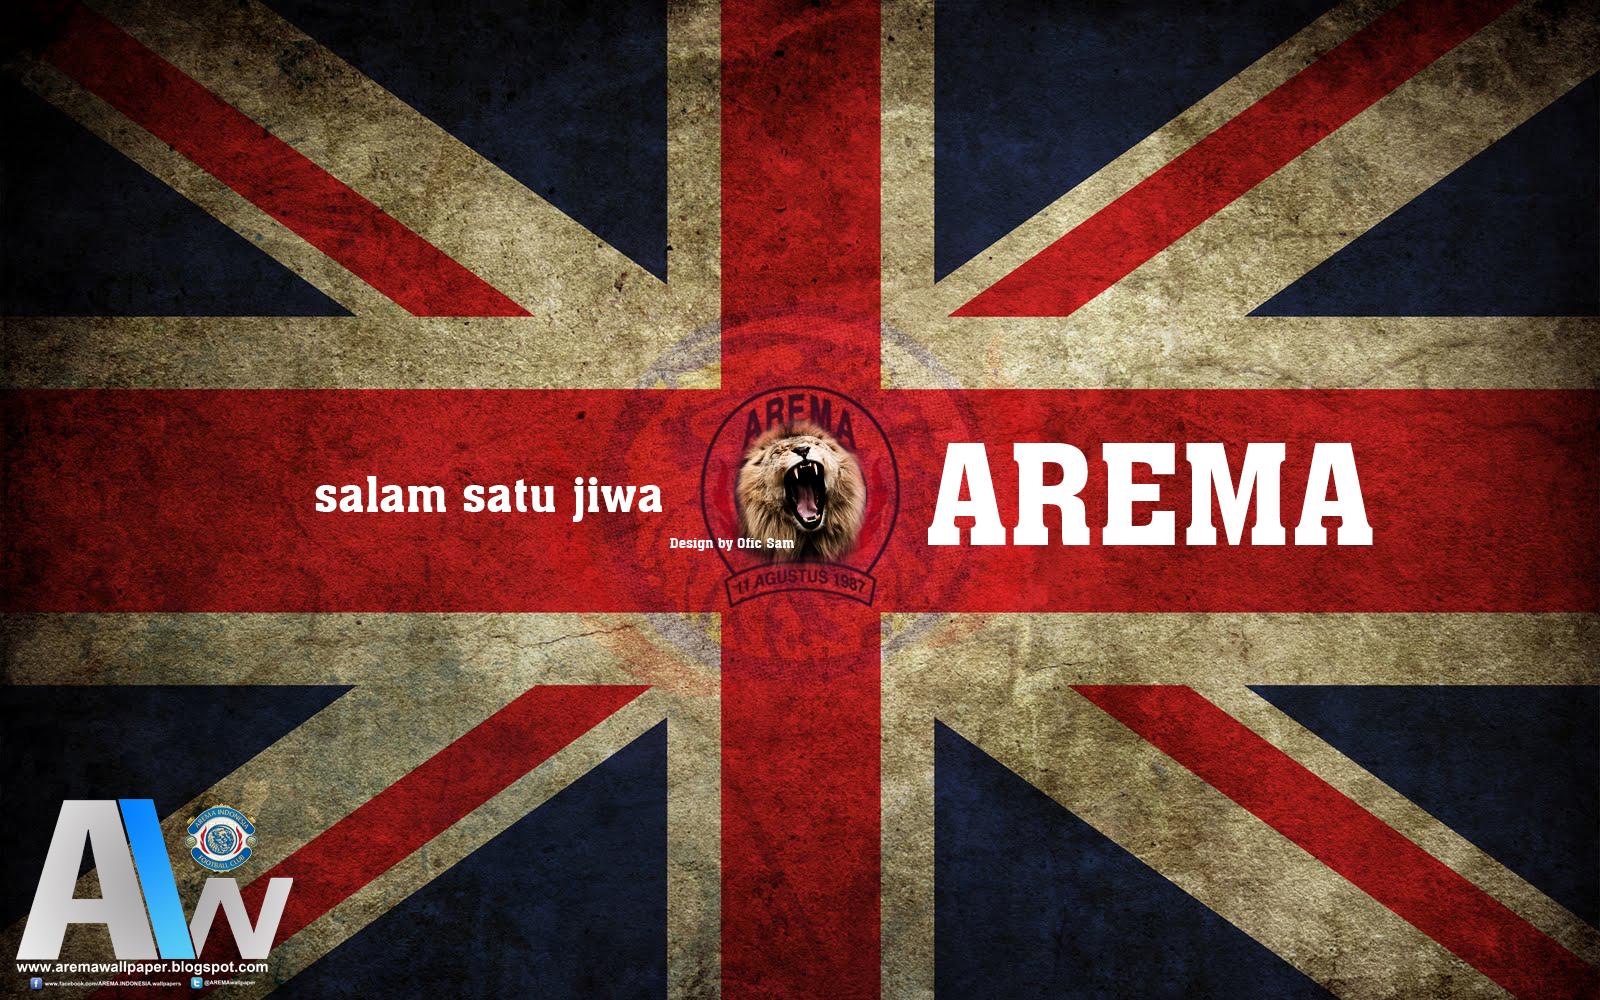 http://1.bp.blogspot.com/-nfs_5NgAKw8/TrVVaO9iX5I/AAAAAAAAAuA/GMS3bDTSVVA/s1600/wallpaper+AREMA+INDONESIA+2011+edisi+NOVEMBER%2528flag+AREMA+INDONESIA%2529Ofic+Sam-AREMA+INDONESIA+wallpapers.jpg